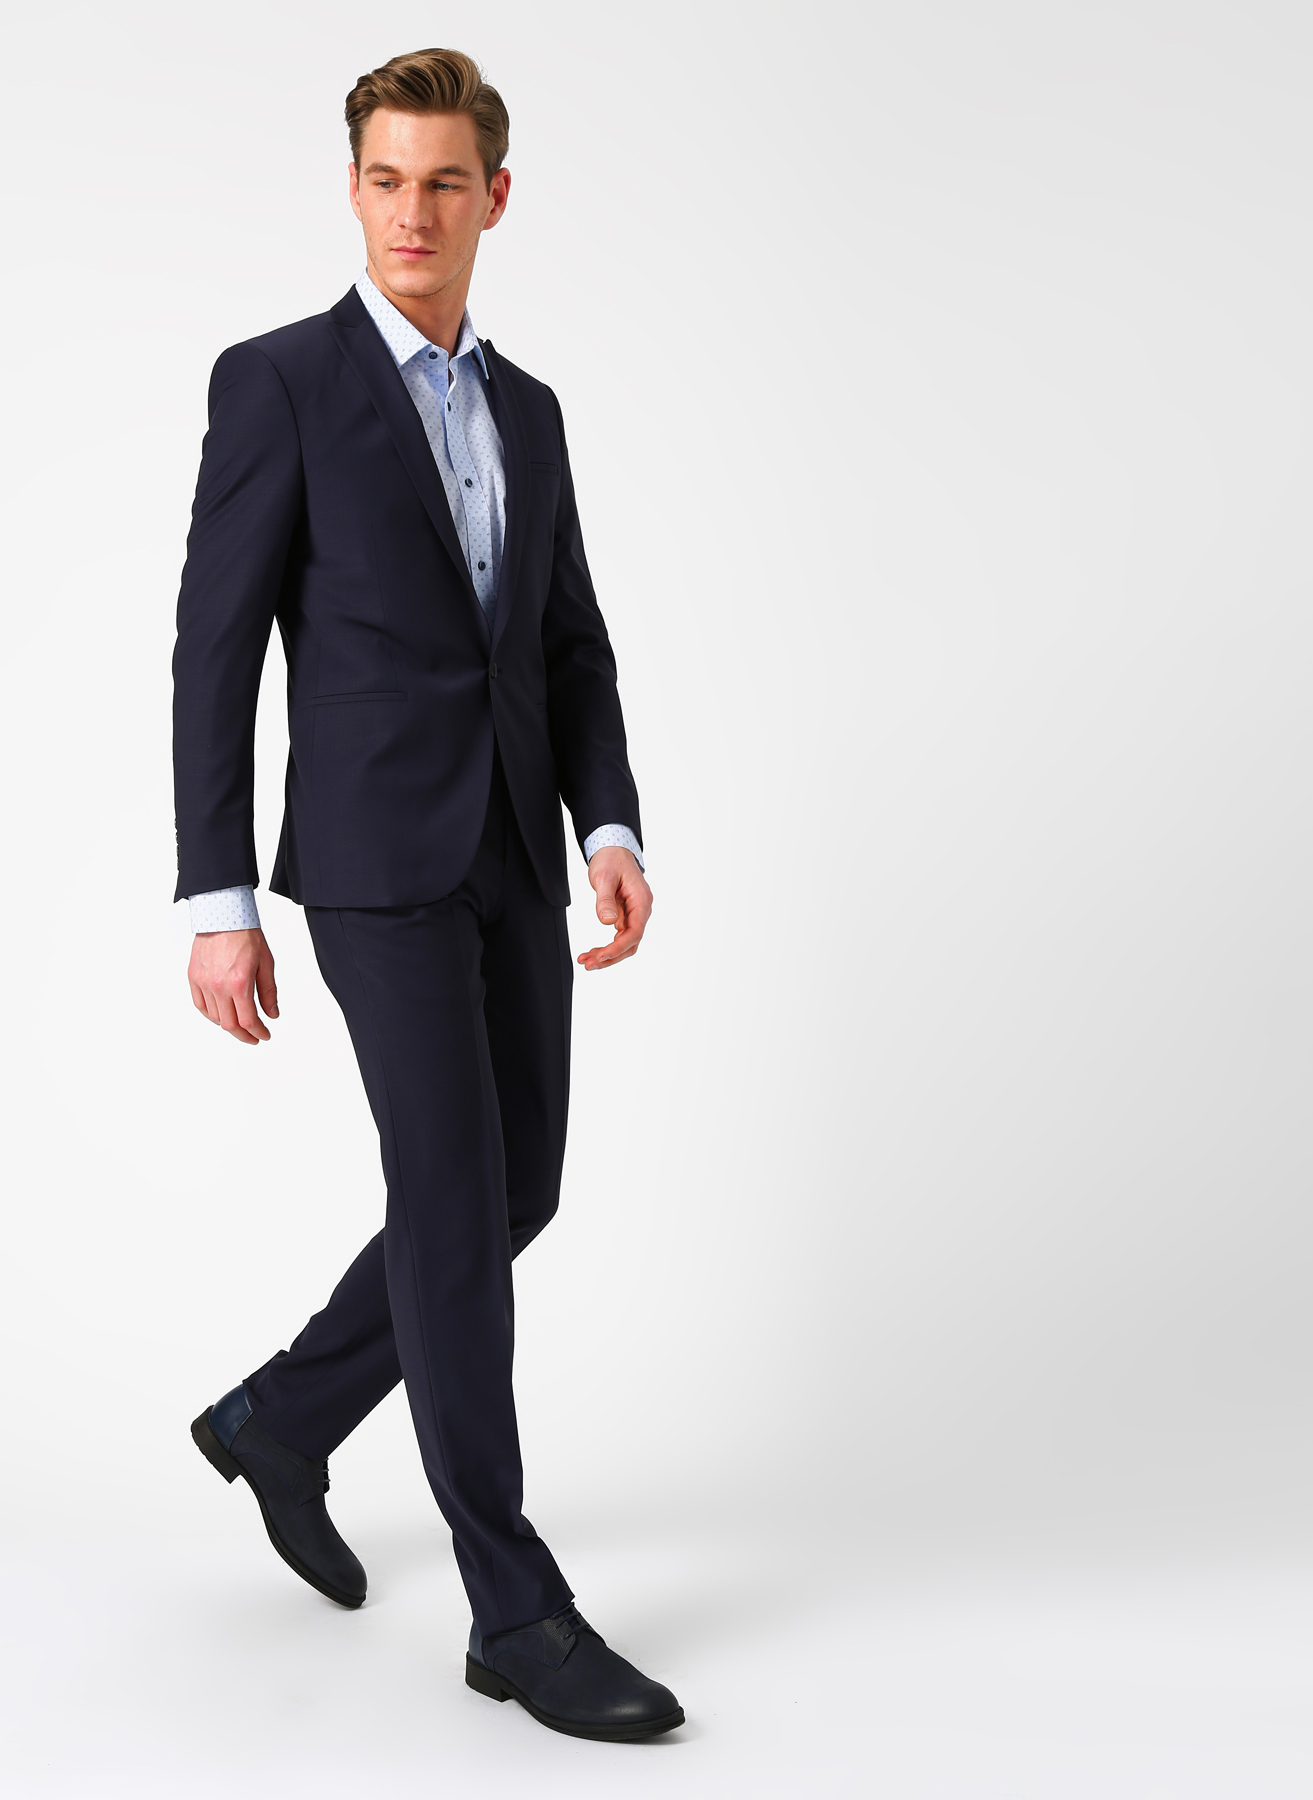 54bcc9b57321b 46-6 Koyu Lacivert Beymen Business Slim Fit Takım Elbise 5002360281001 Erkek  Giyim